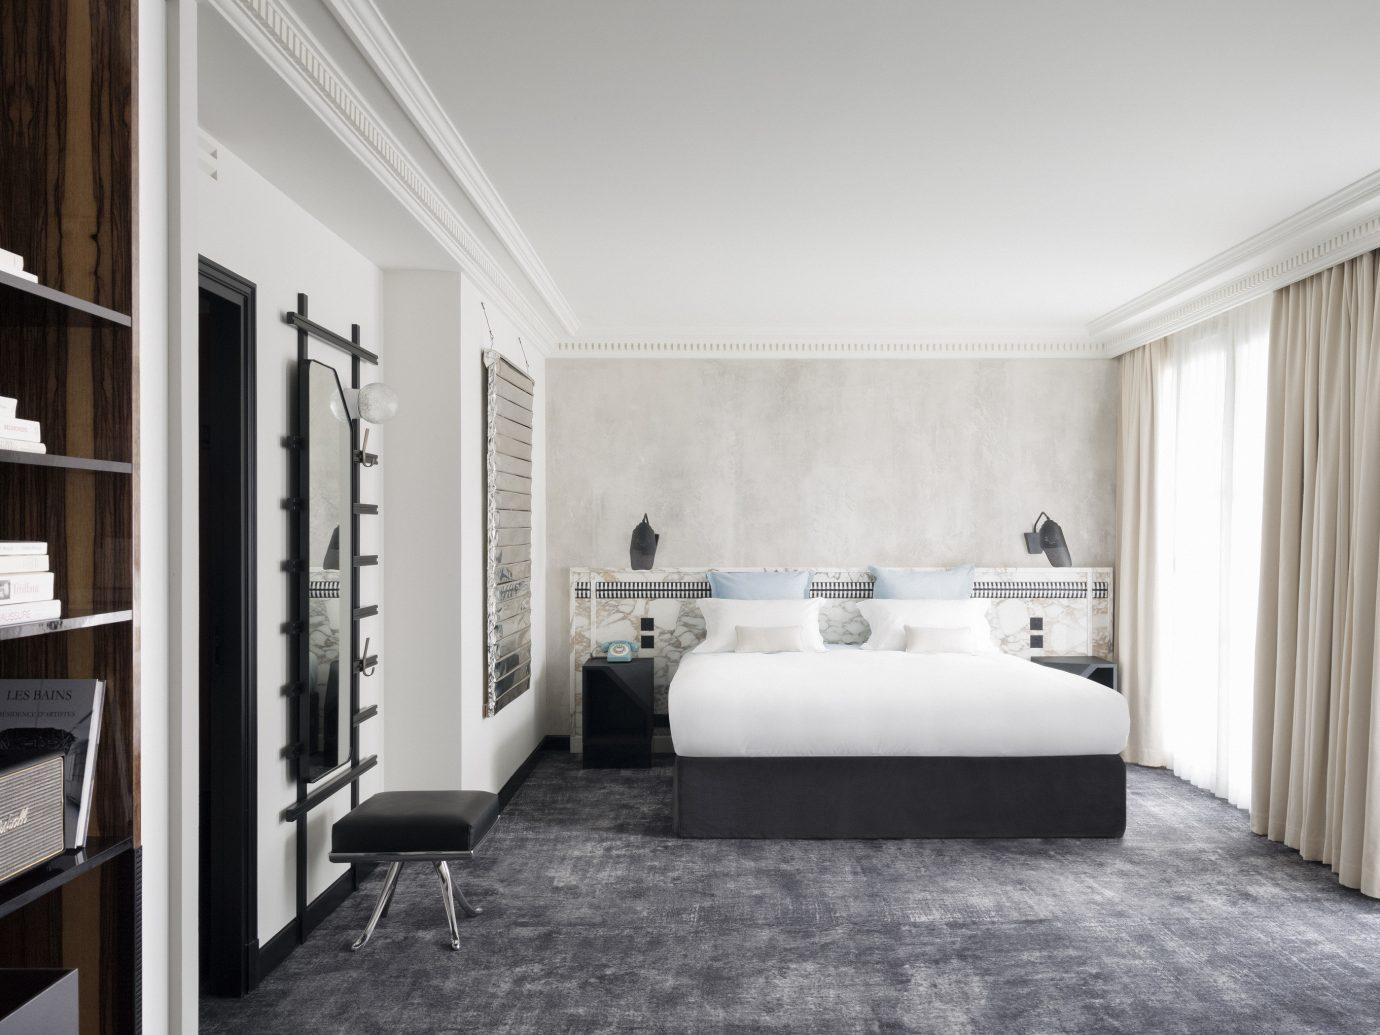 Boutique Hotels Hotels indoor floor wall room property Living living room interior design home real estate estate Bedroom white Suite Design condominium furniture apartment